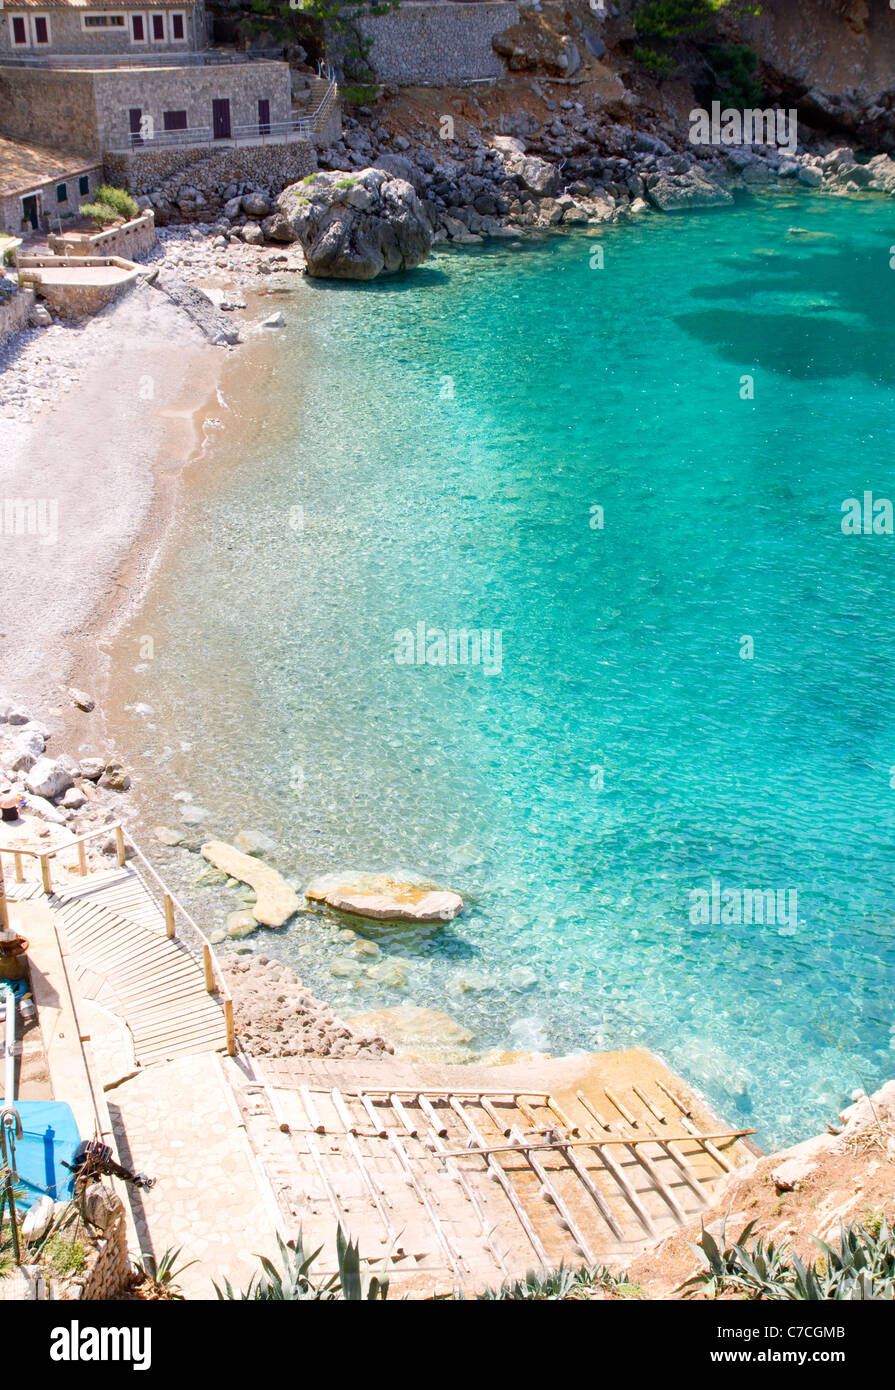 Sa Calobra playa desde el punto de vista alto en Escorca Mallorca en las Islas Baleares Imagen De Stock